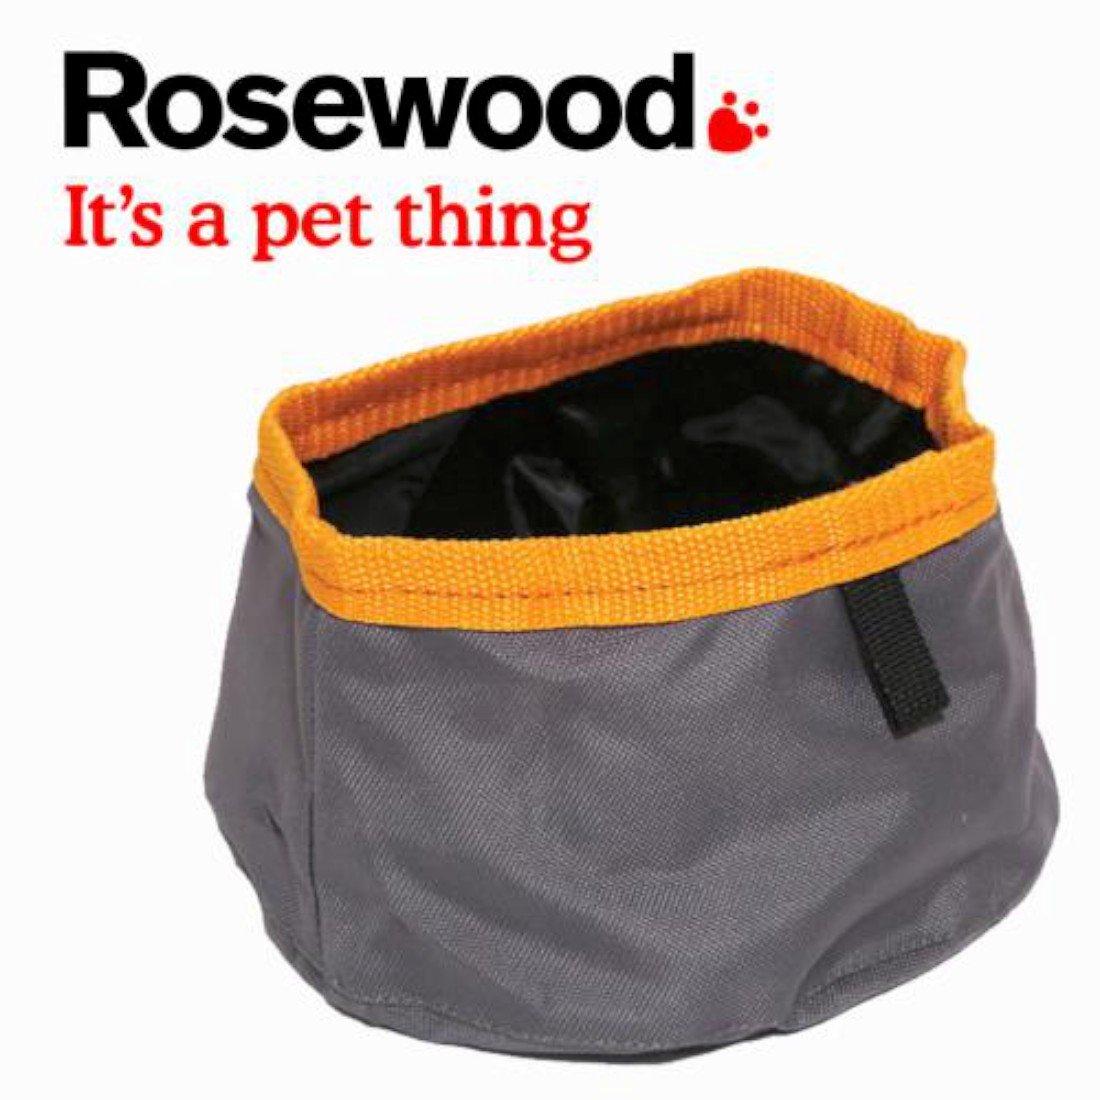 Rosewood Standard Portabowl Portable Folding Travel Food or Water Dog Bowl 1.5L